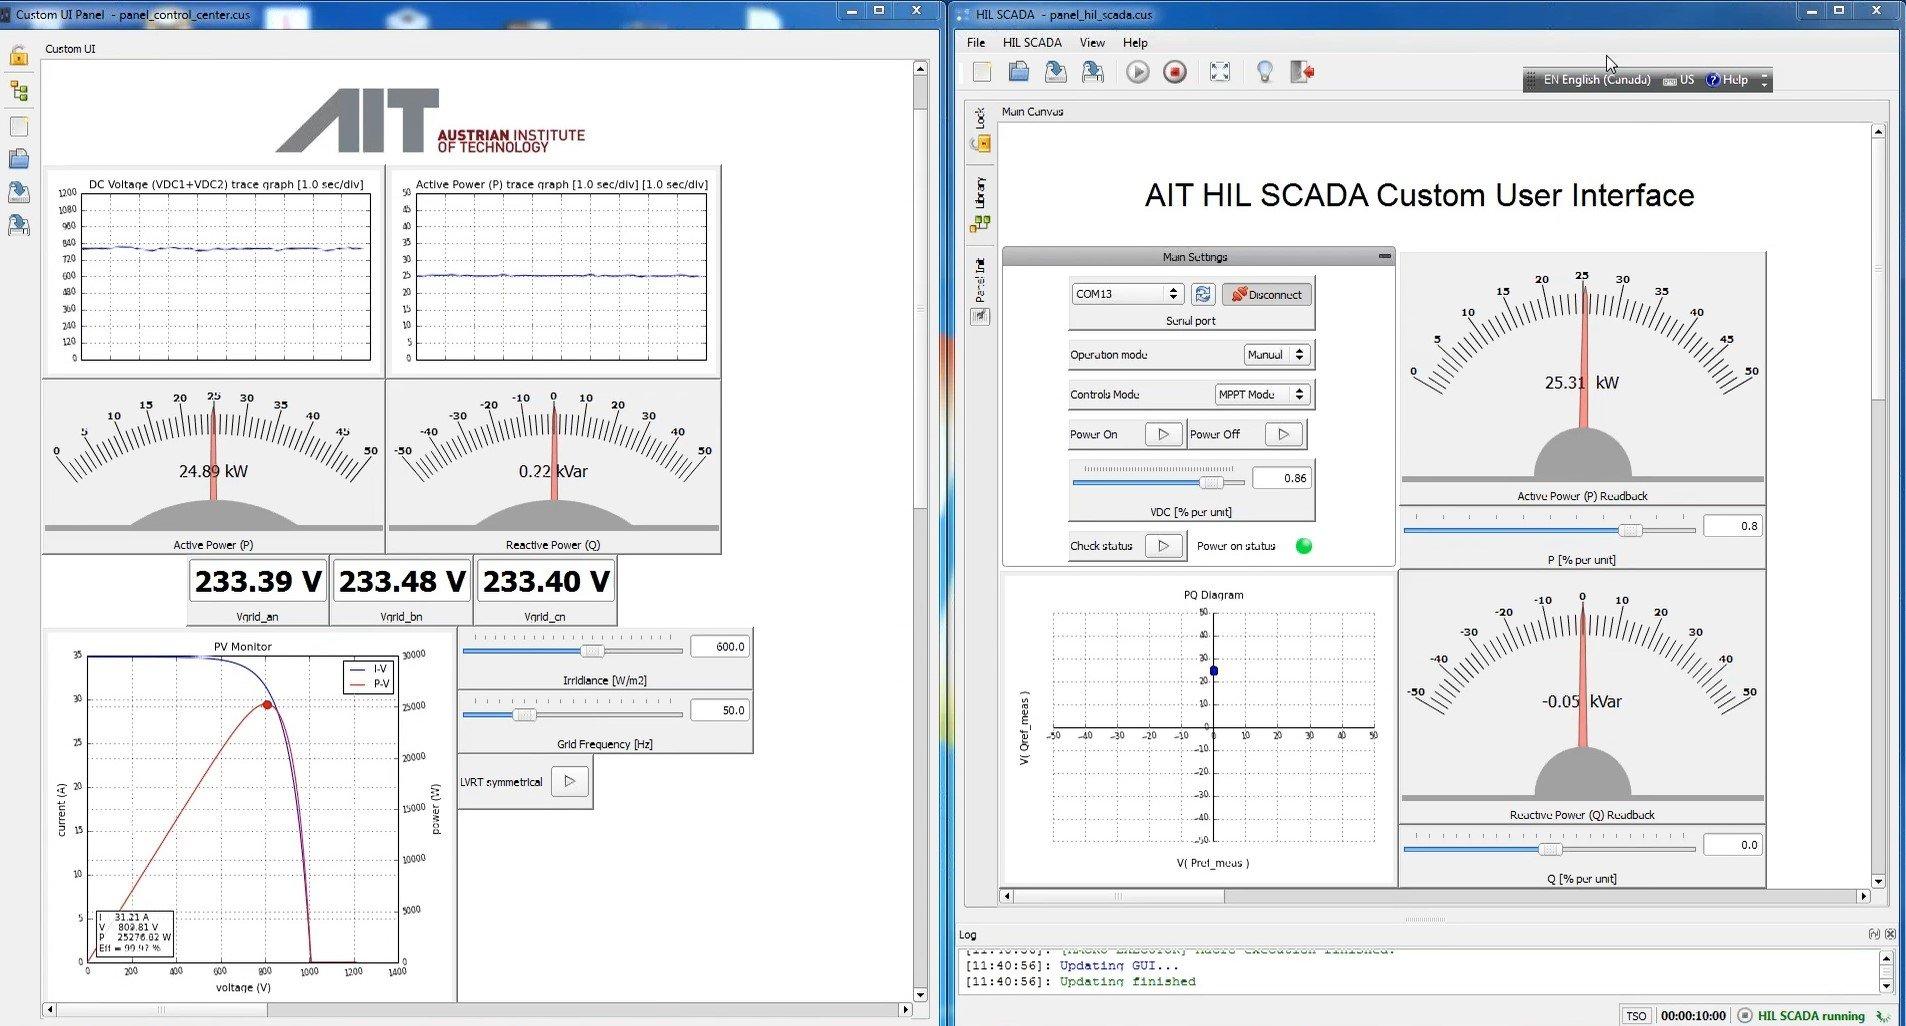 AIT HIL SCADA Custom user interface